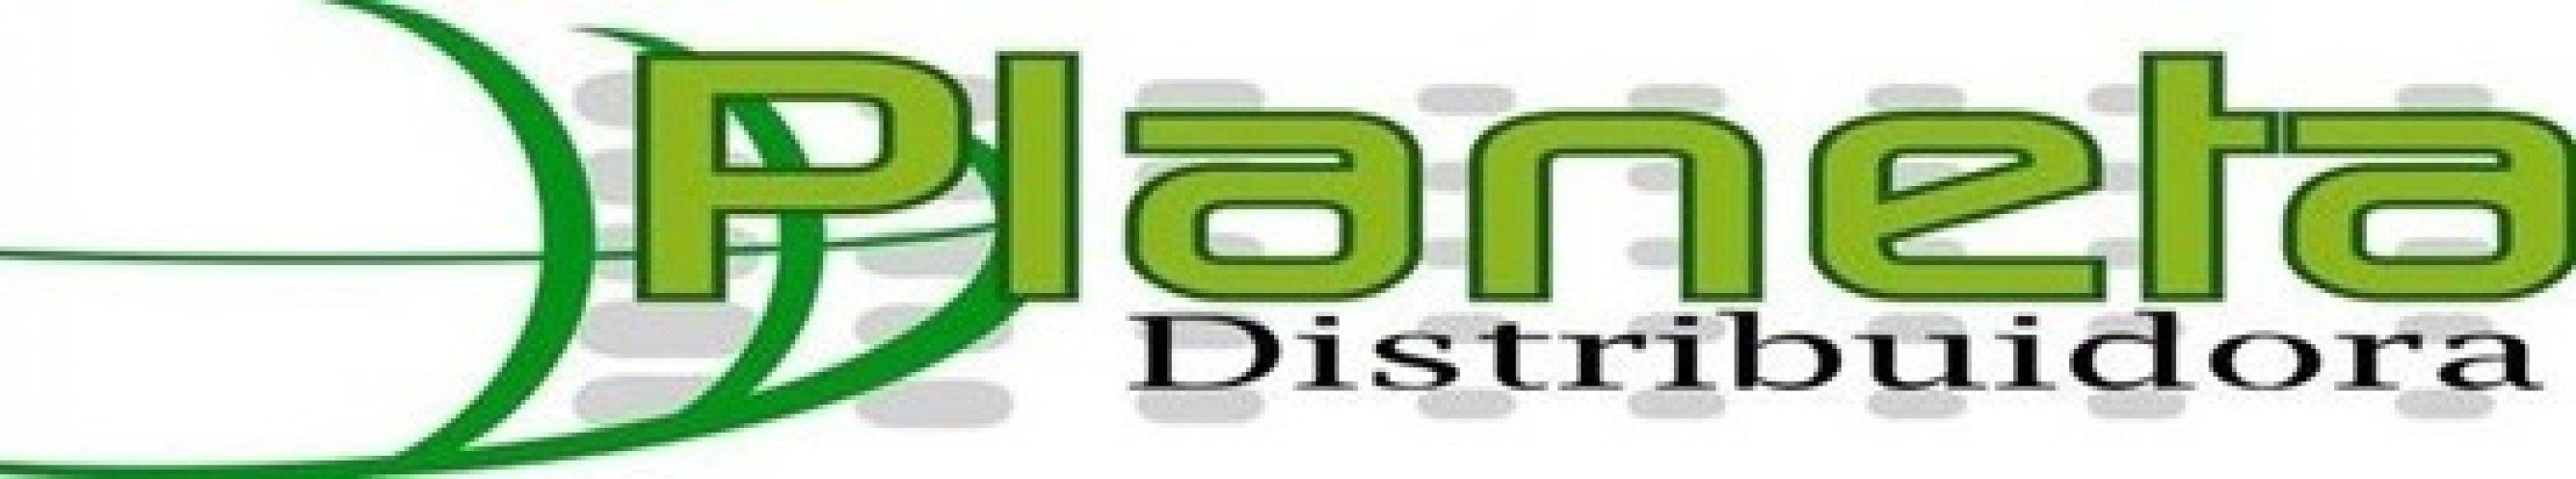 PLANETA Distribuidora